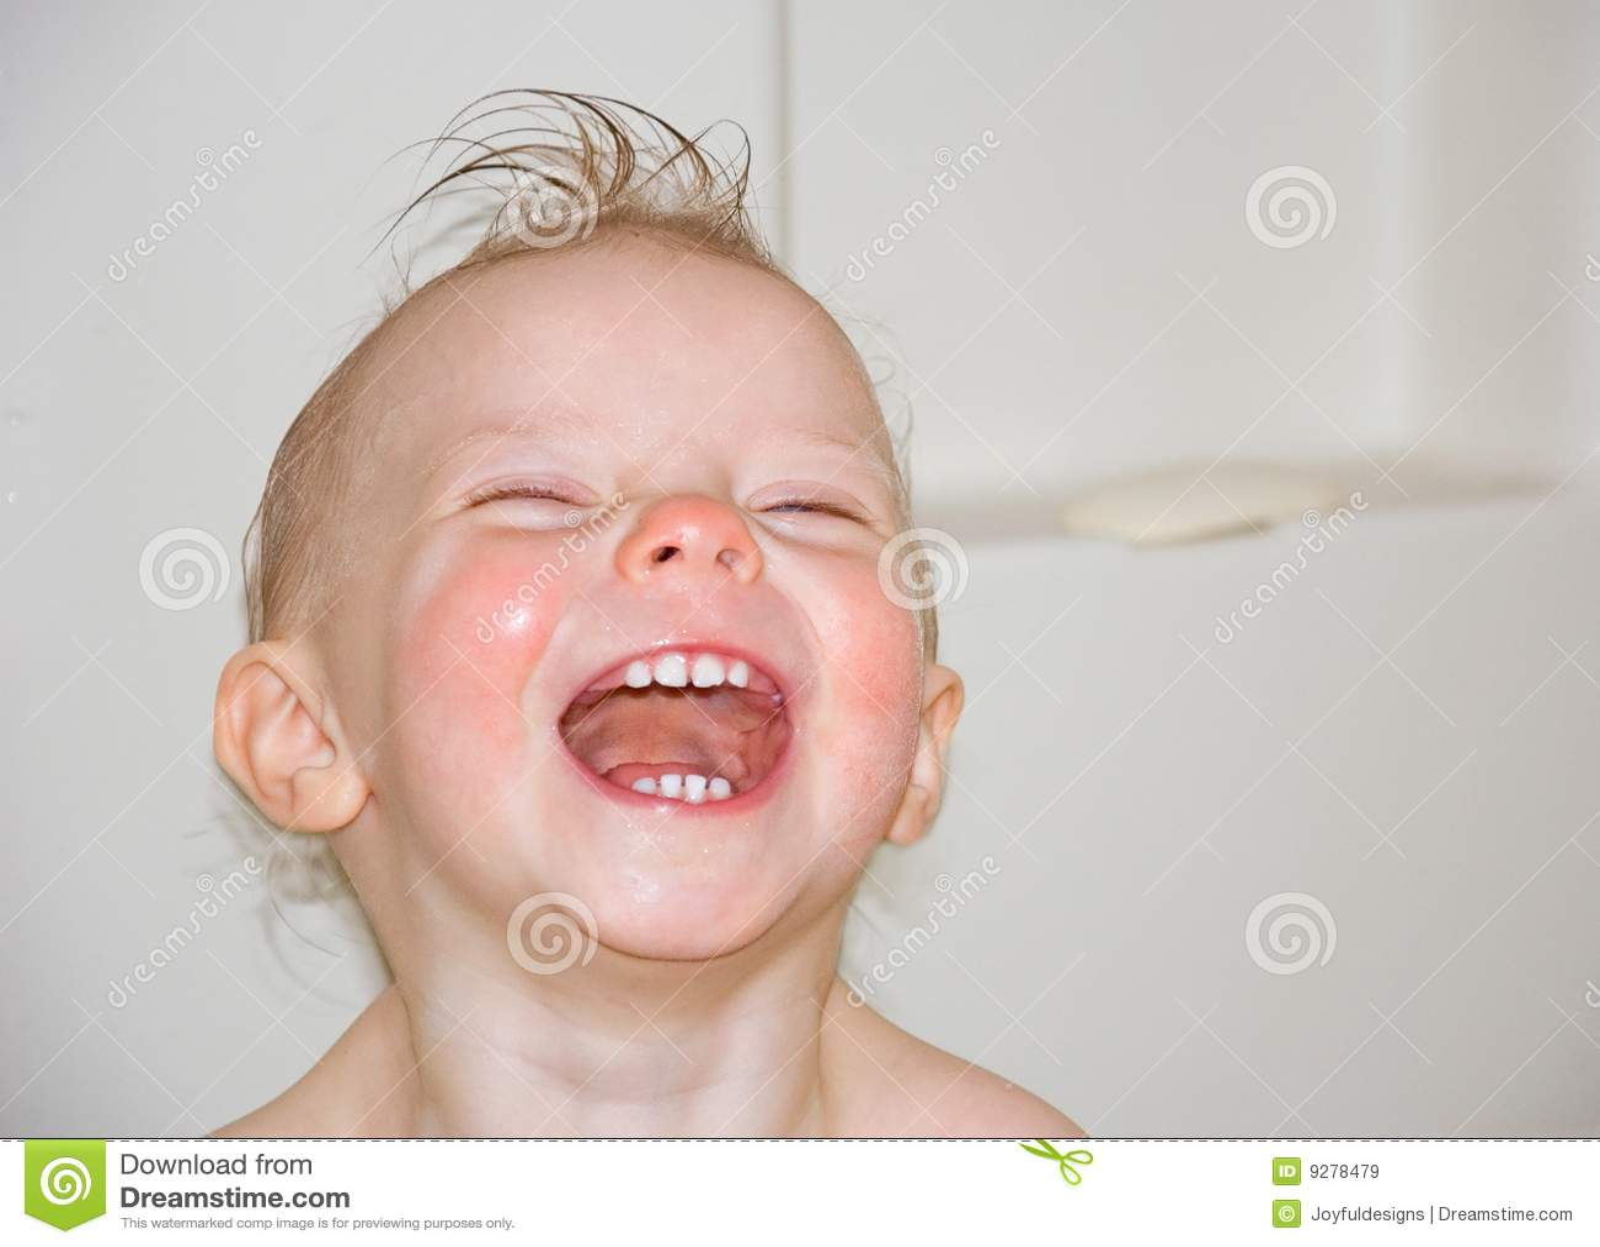 Vasca Da Bagno Bambini : Riduttore vasca bagno bambino riduttore vasca bagno bambini